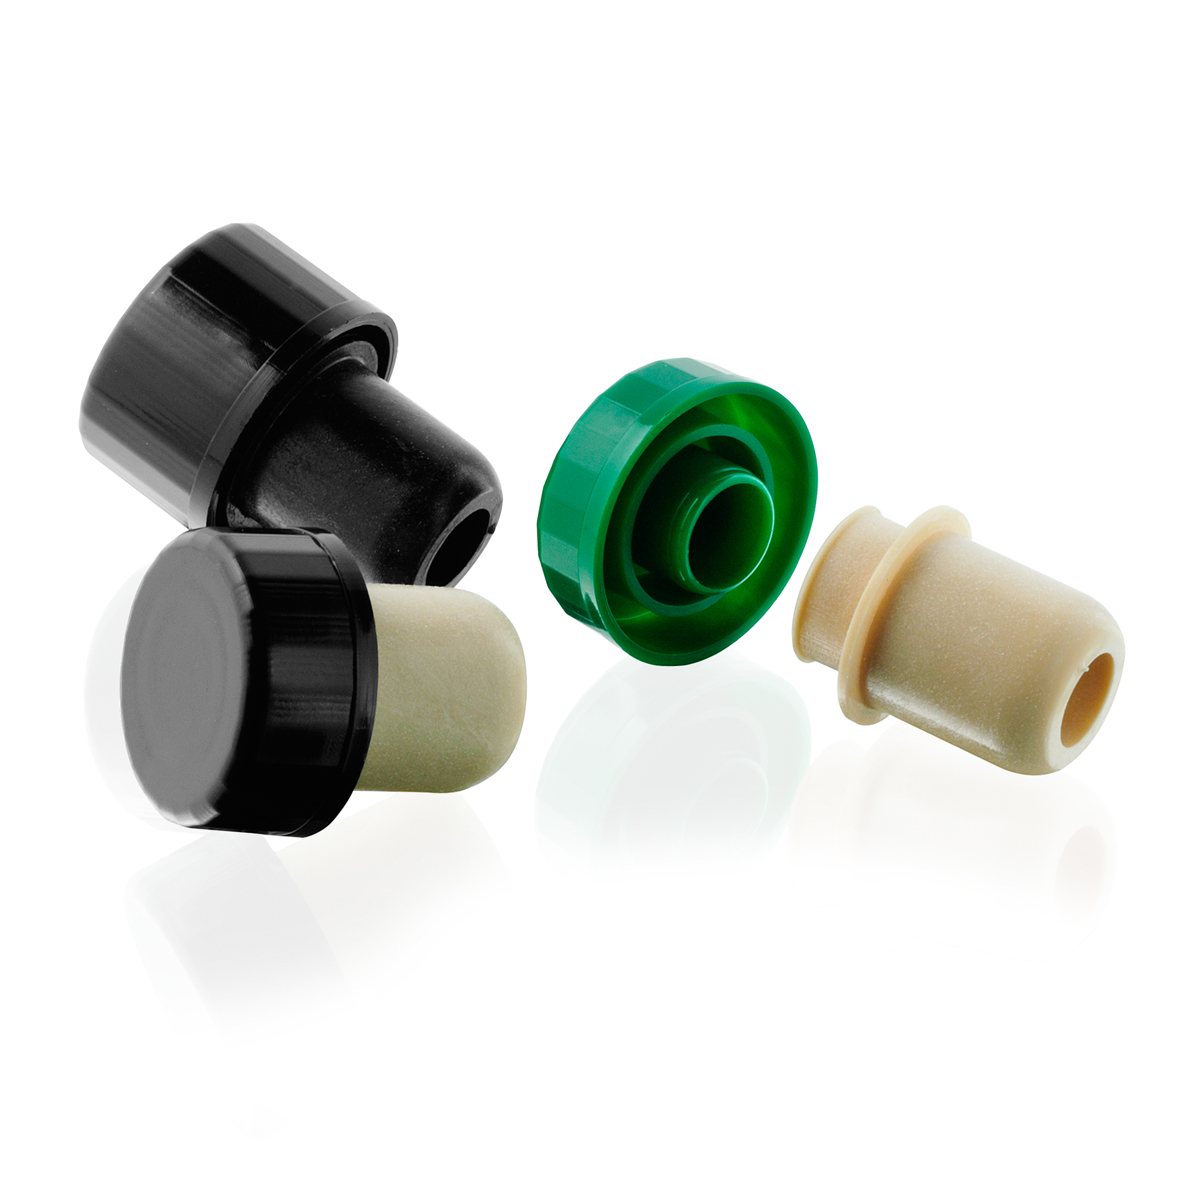 thetis pack πώμα με πλαστική κεφαλή συνθετικό με δείκτη ροής wooden head synthetic cap versatore pourer